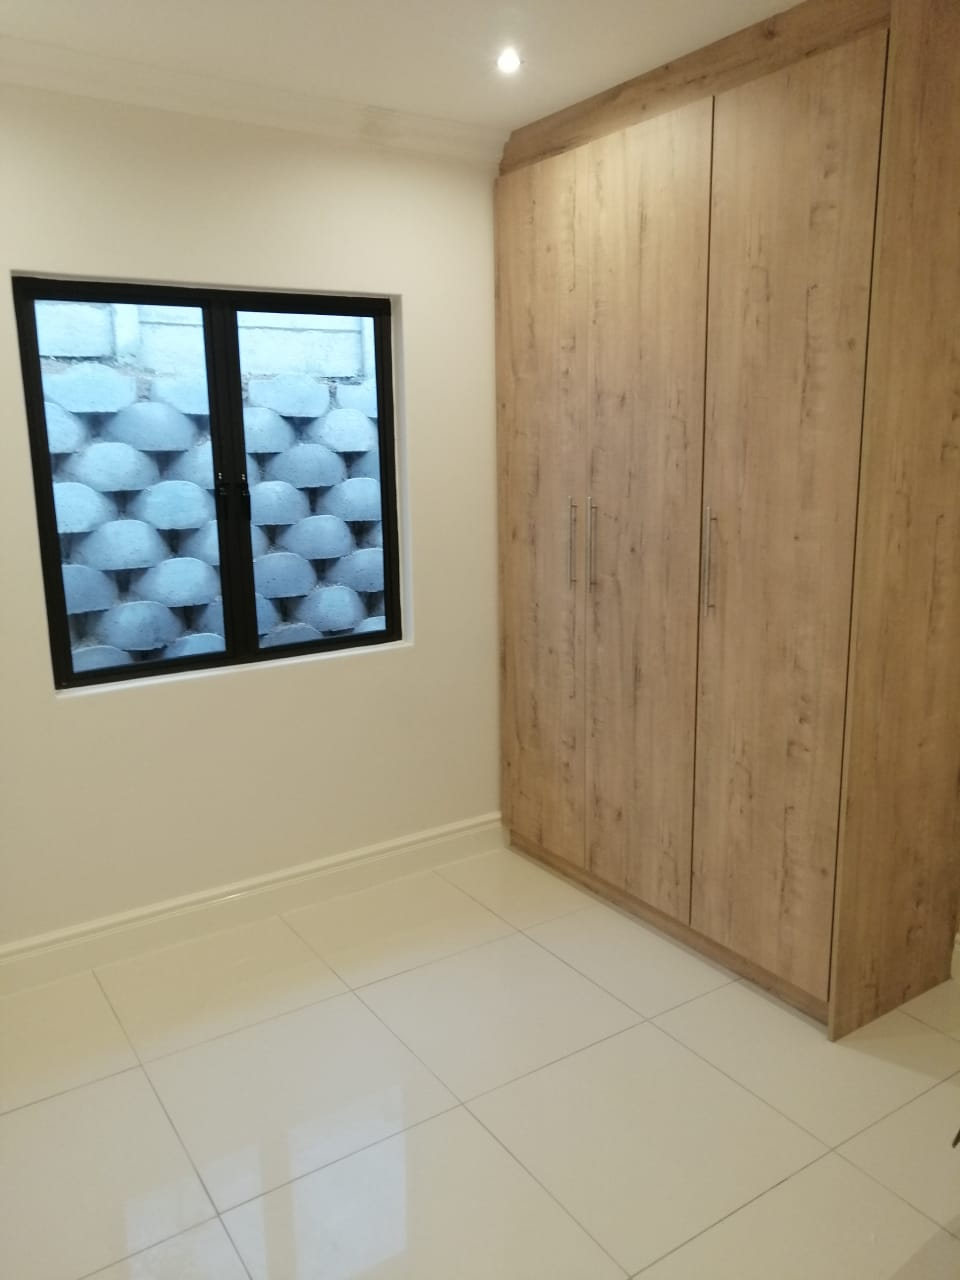 Stunning 3 Bedroom simplex in Hillary/Malvern